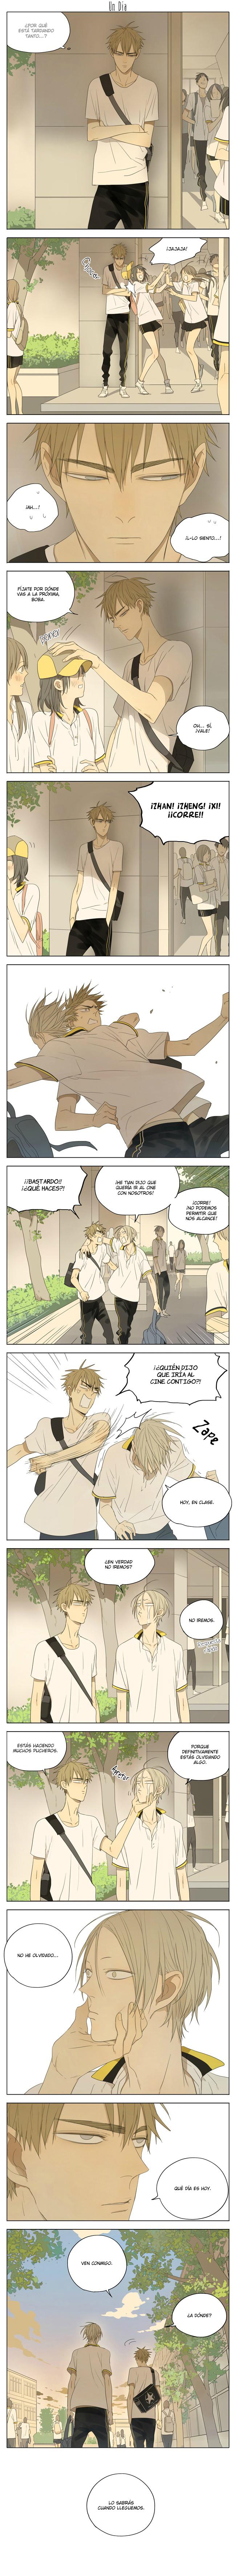 http://c5.ninemanga.com/es_manga/7/15943/392074/2232e29ea9fd66ea233e4bdabb75b627.jpg Page 6